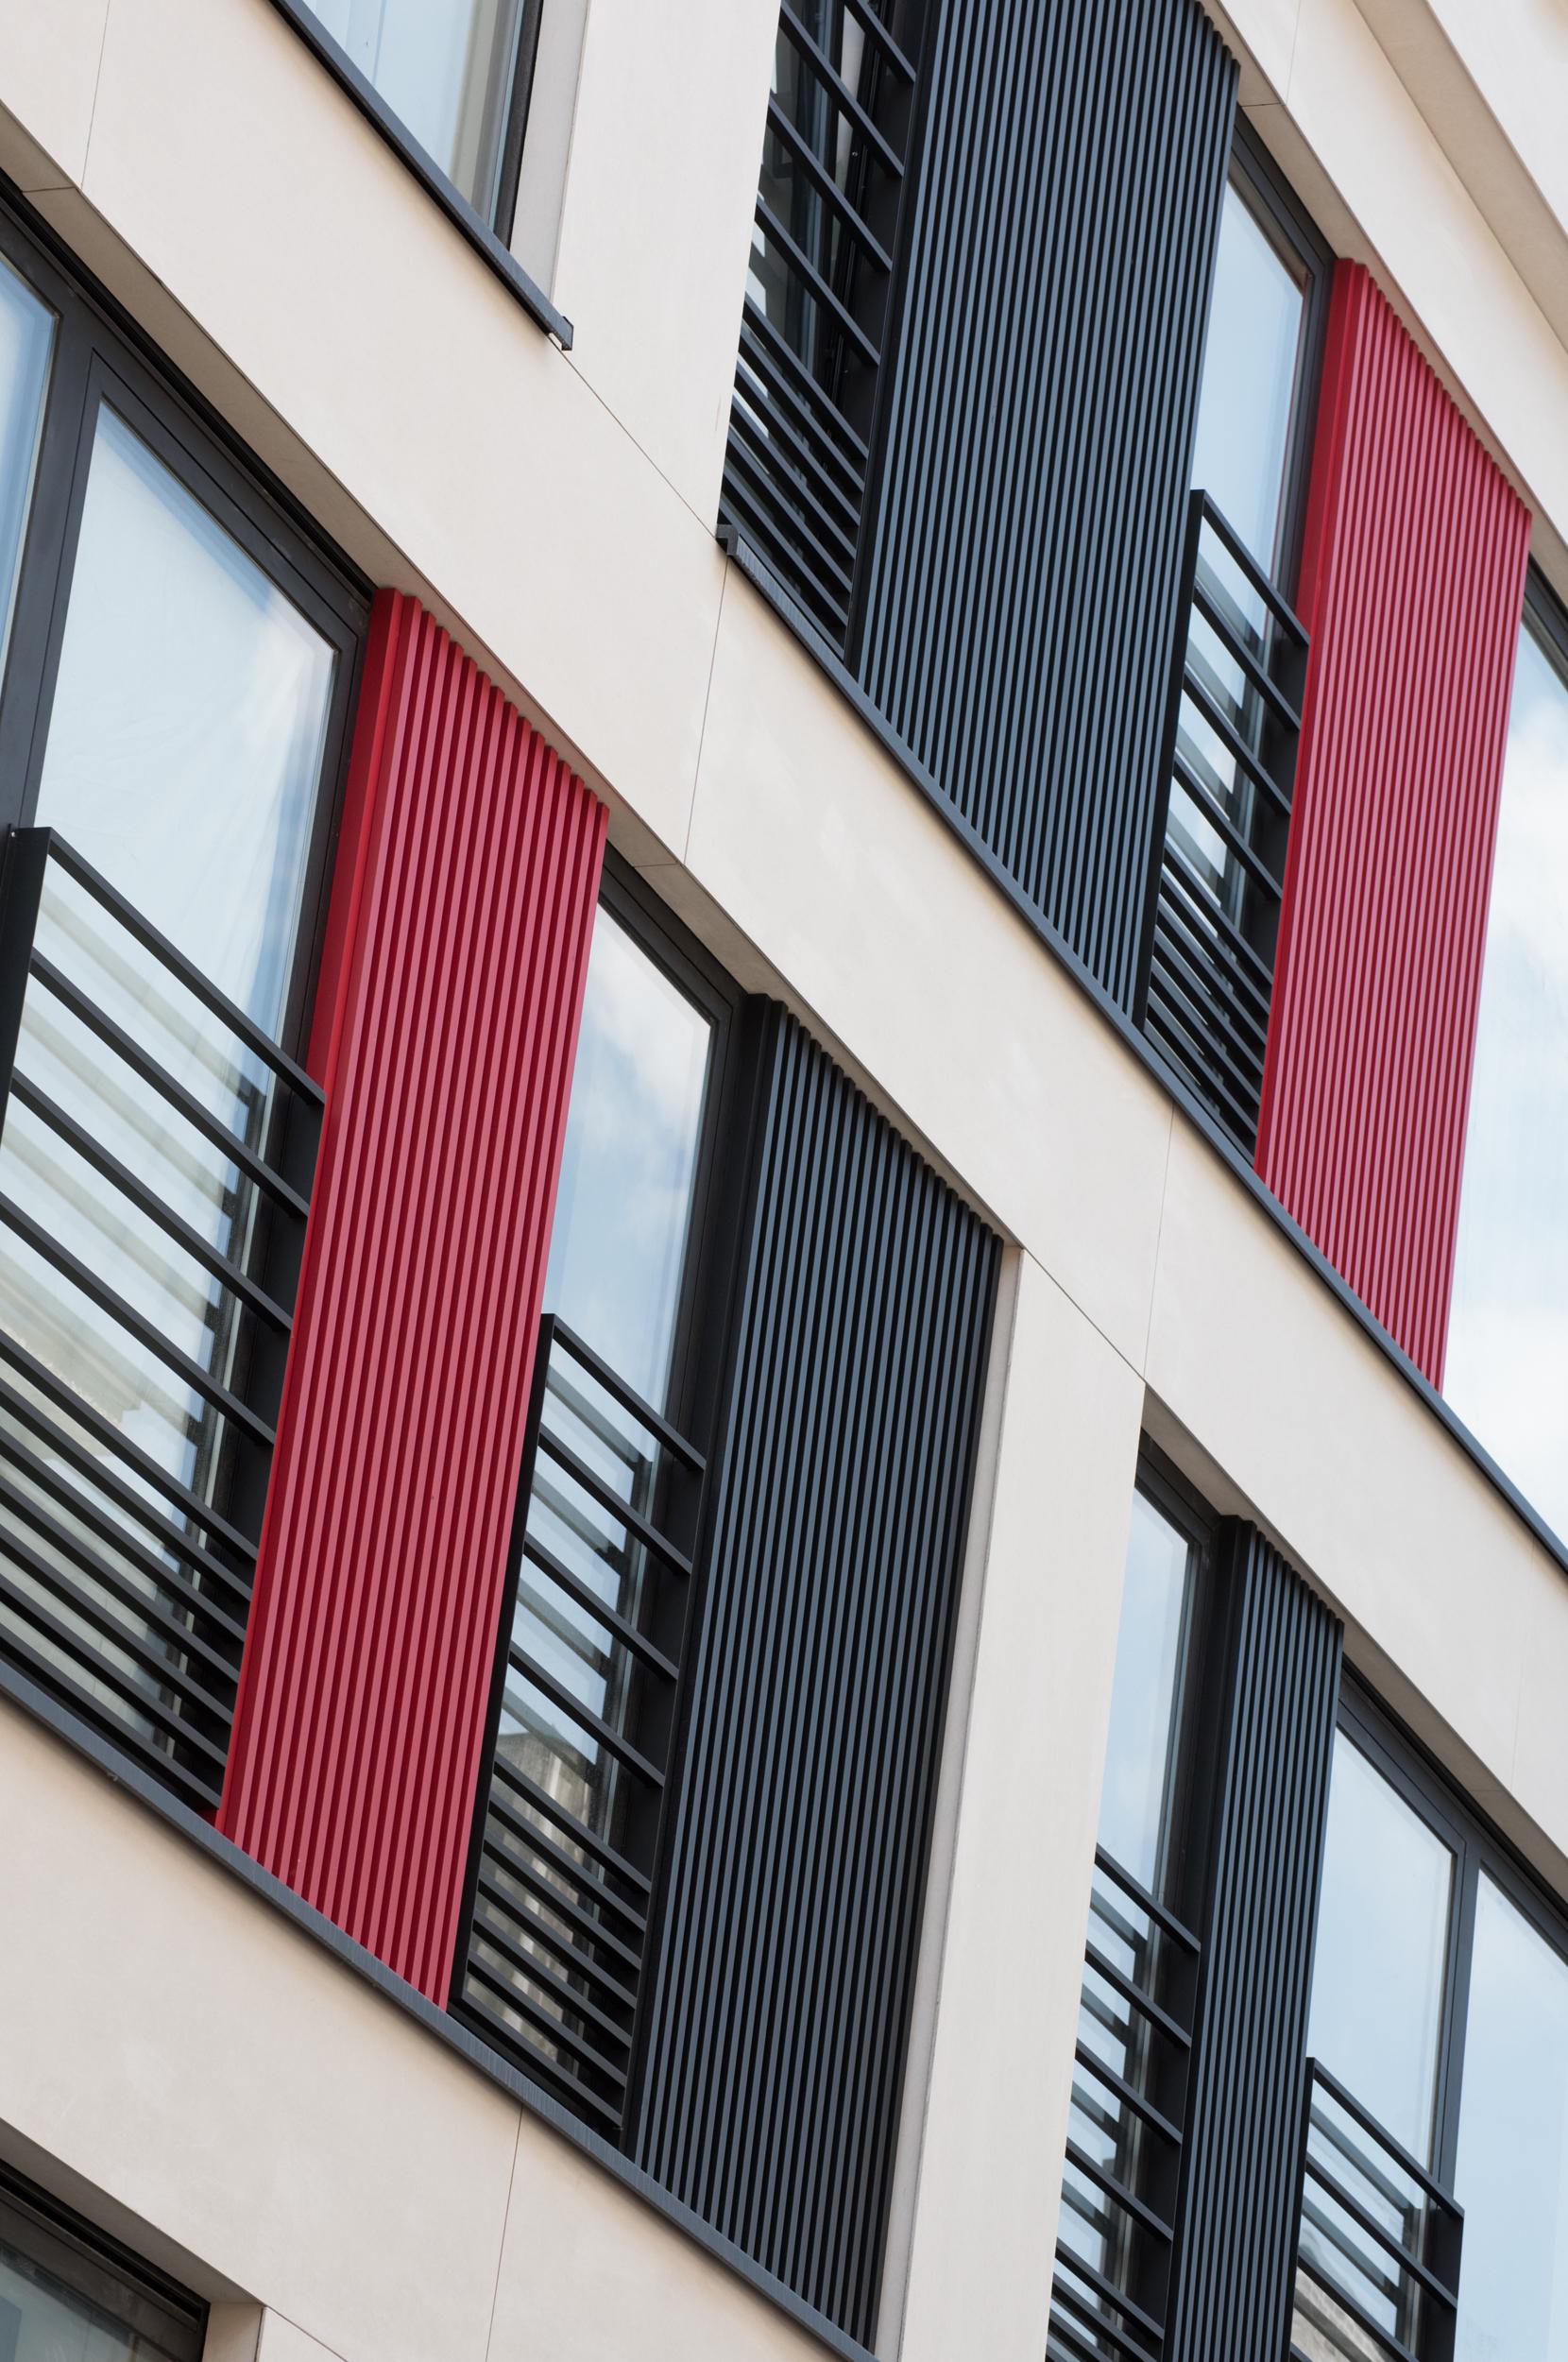 mato aluminium gevelbekleding zwart rood.jpg